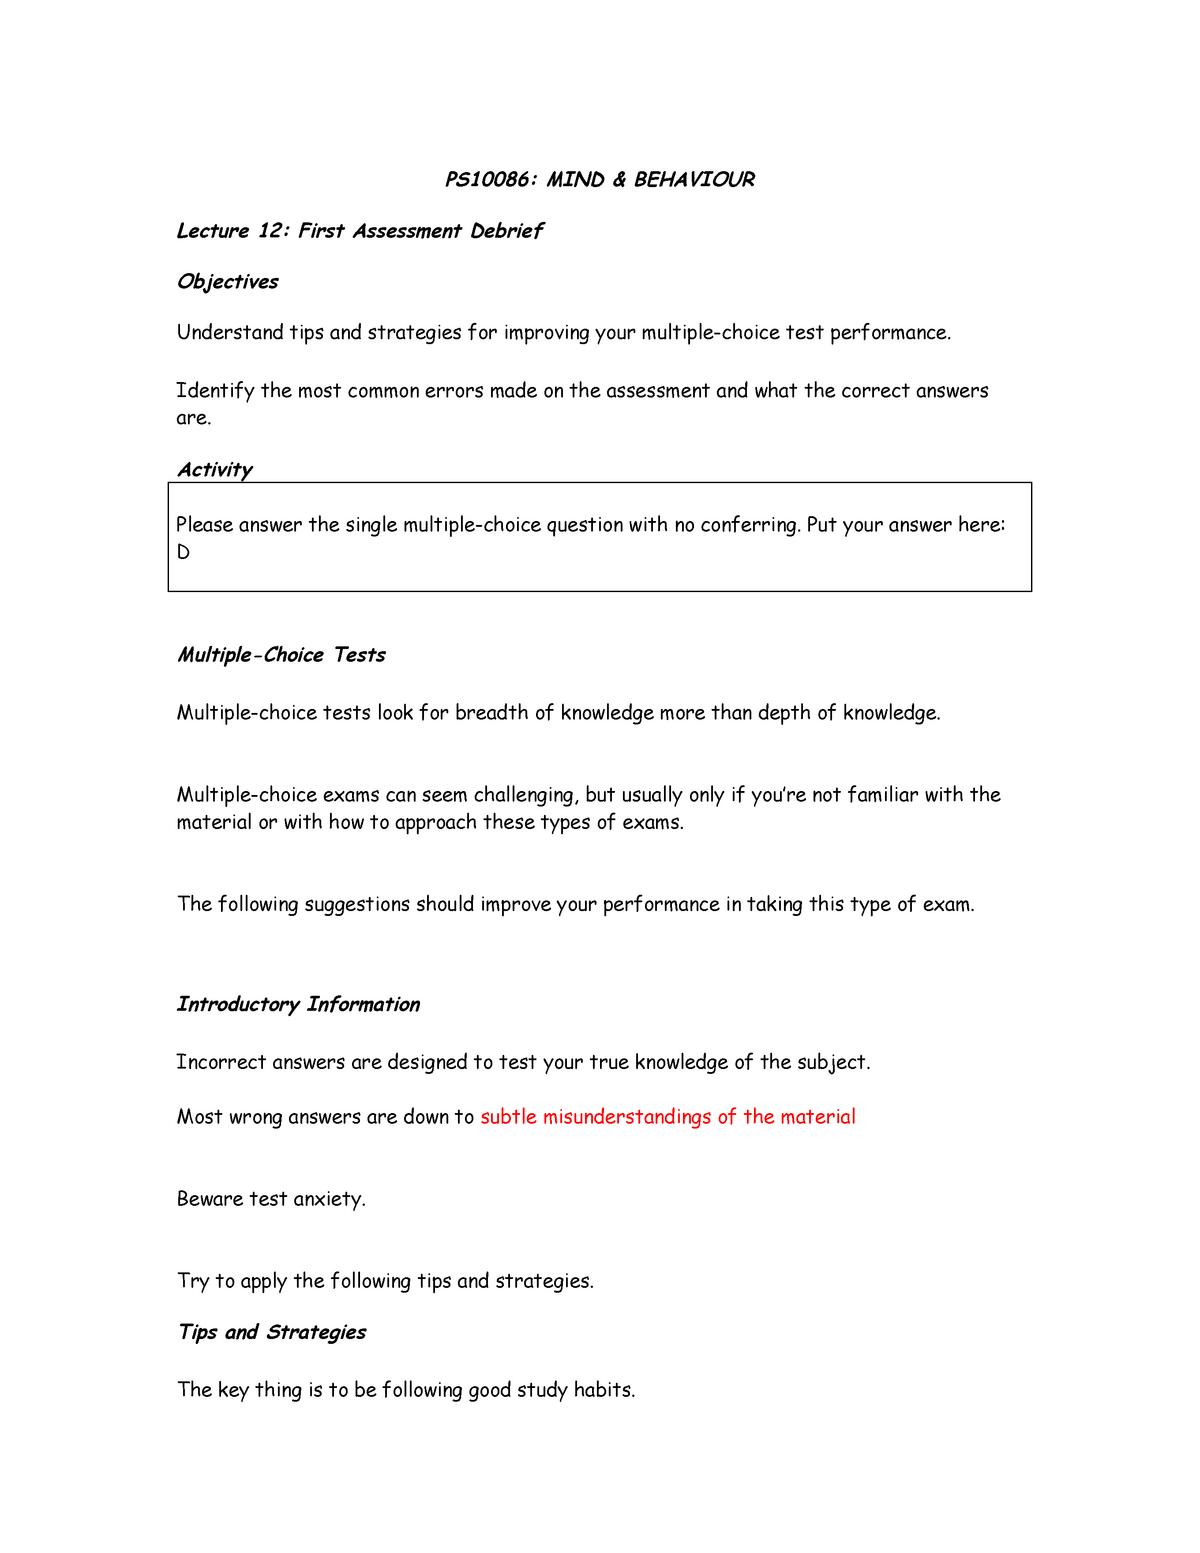 Lecture 12 Mock Exam Debrief Handout - PS10086 - StuDocu